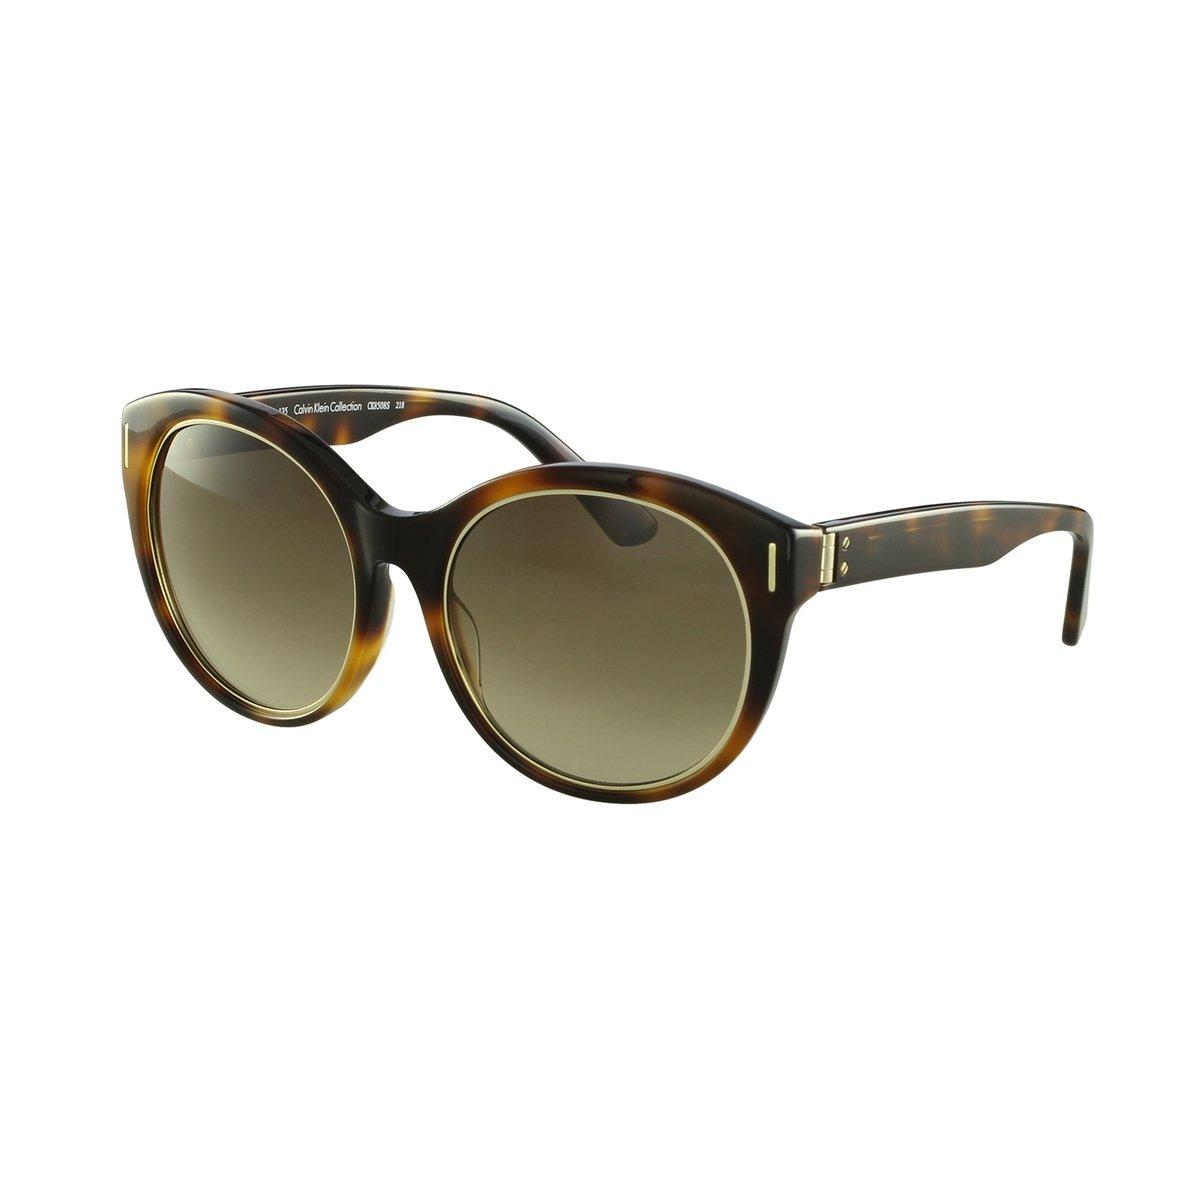 73b2552f3b3cb Óculos de Sol Calvin Klein Fashion Marrom - Marrom - Compre Agora ...